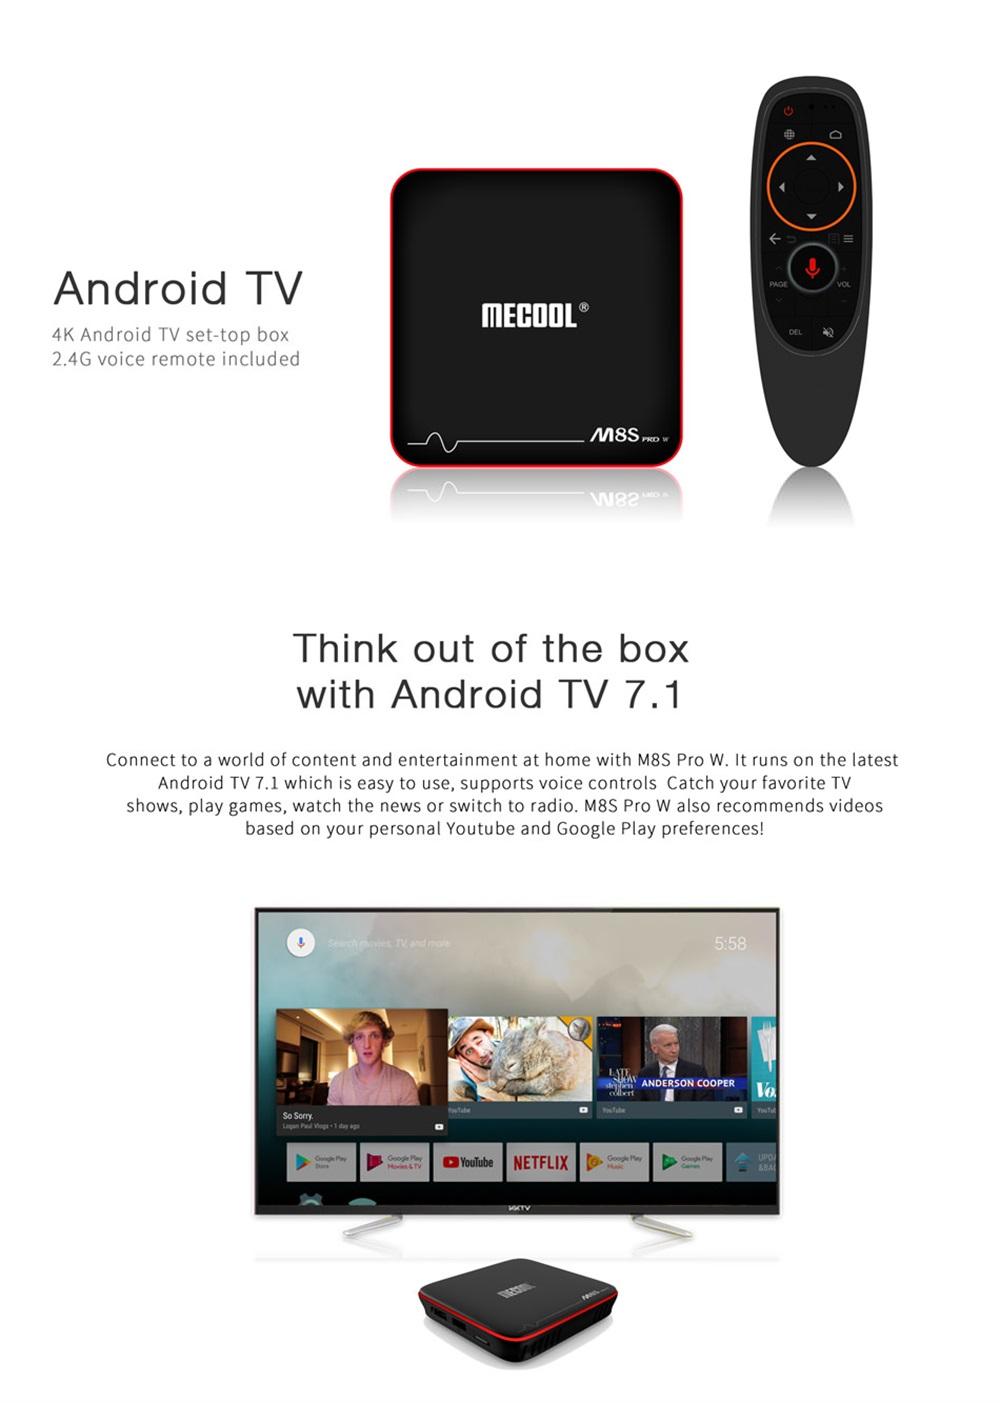 buy mecool m8s pro w tv box